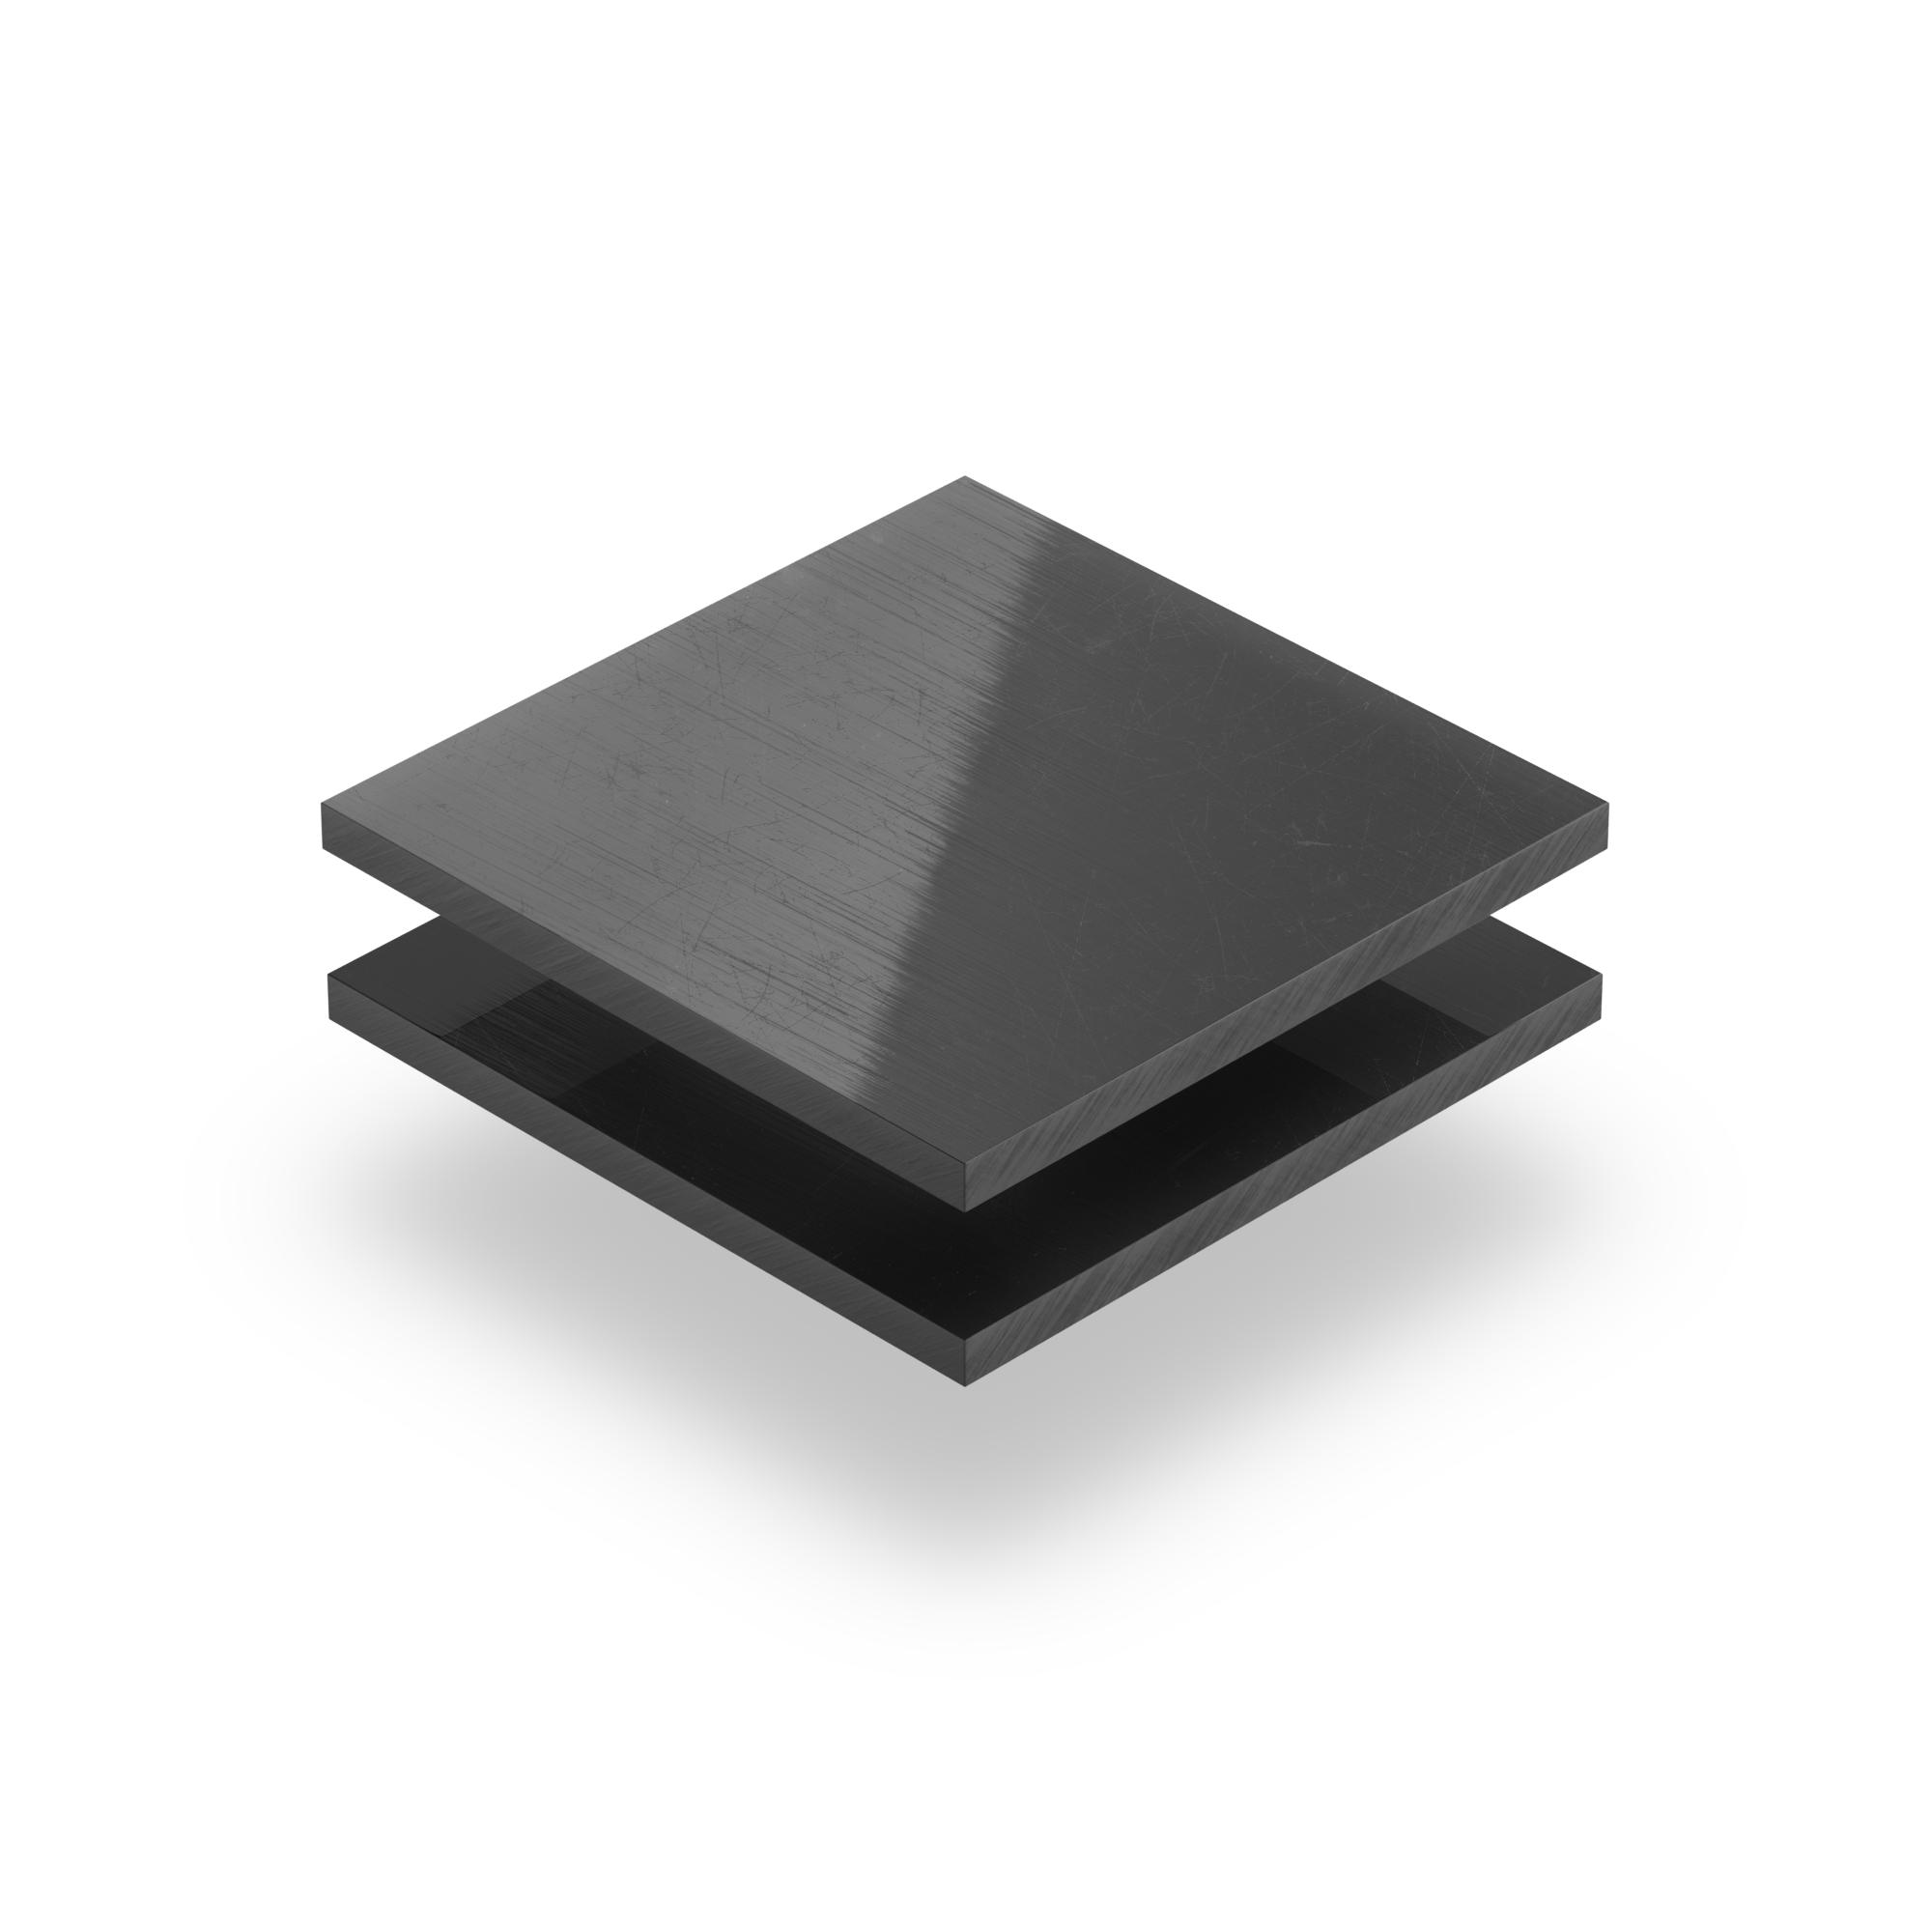 75 x 40 cm 3mm XT Acryl-Zuschnitt//Plexiglas-Platte schwarz